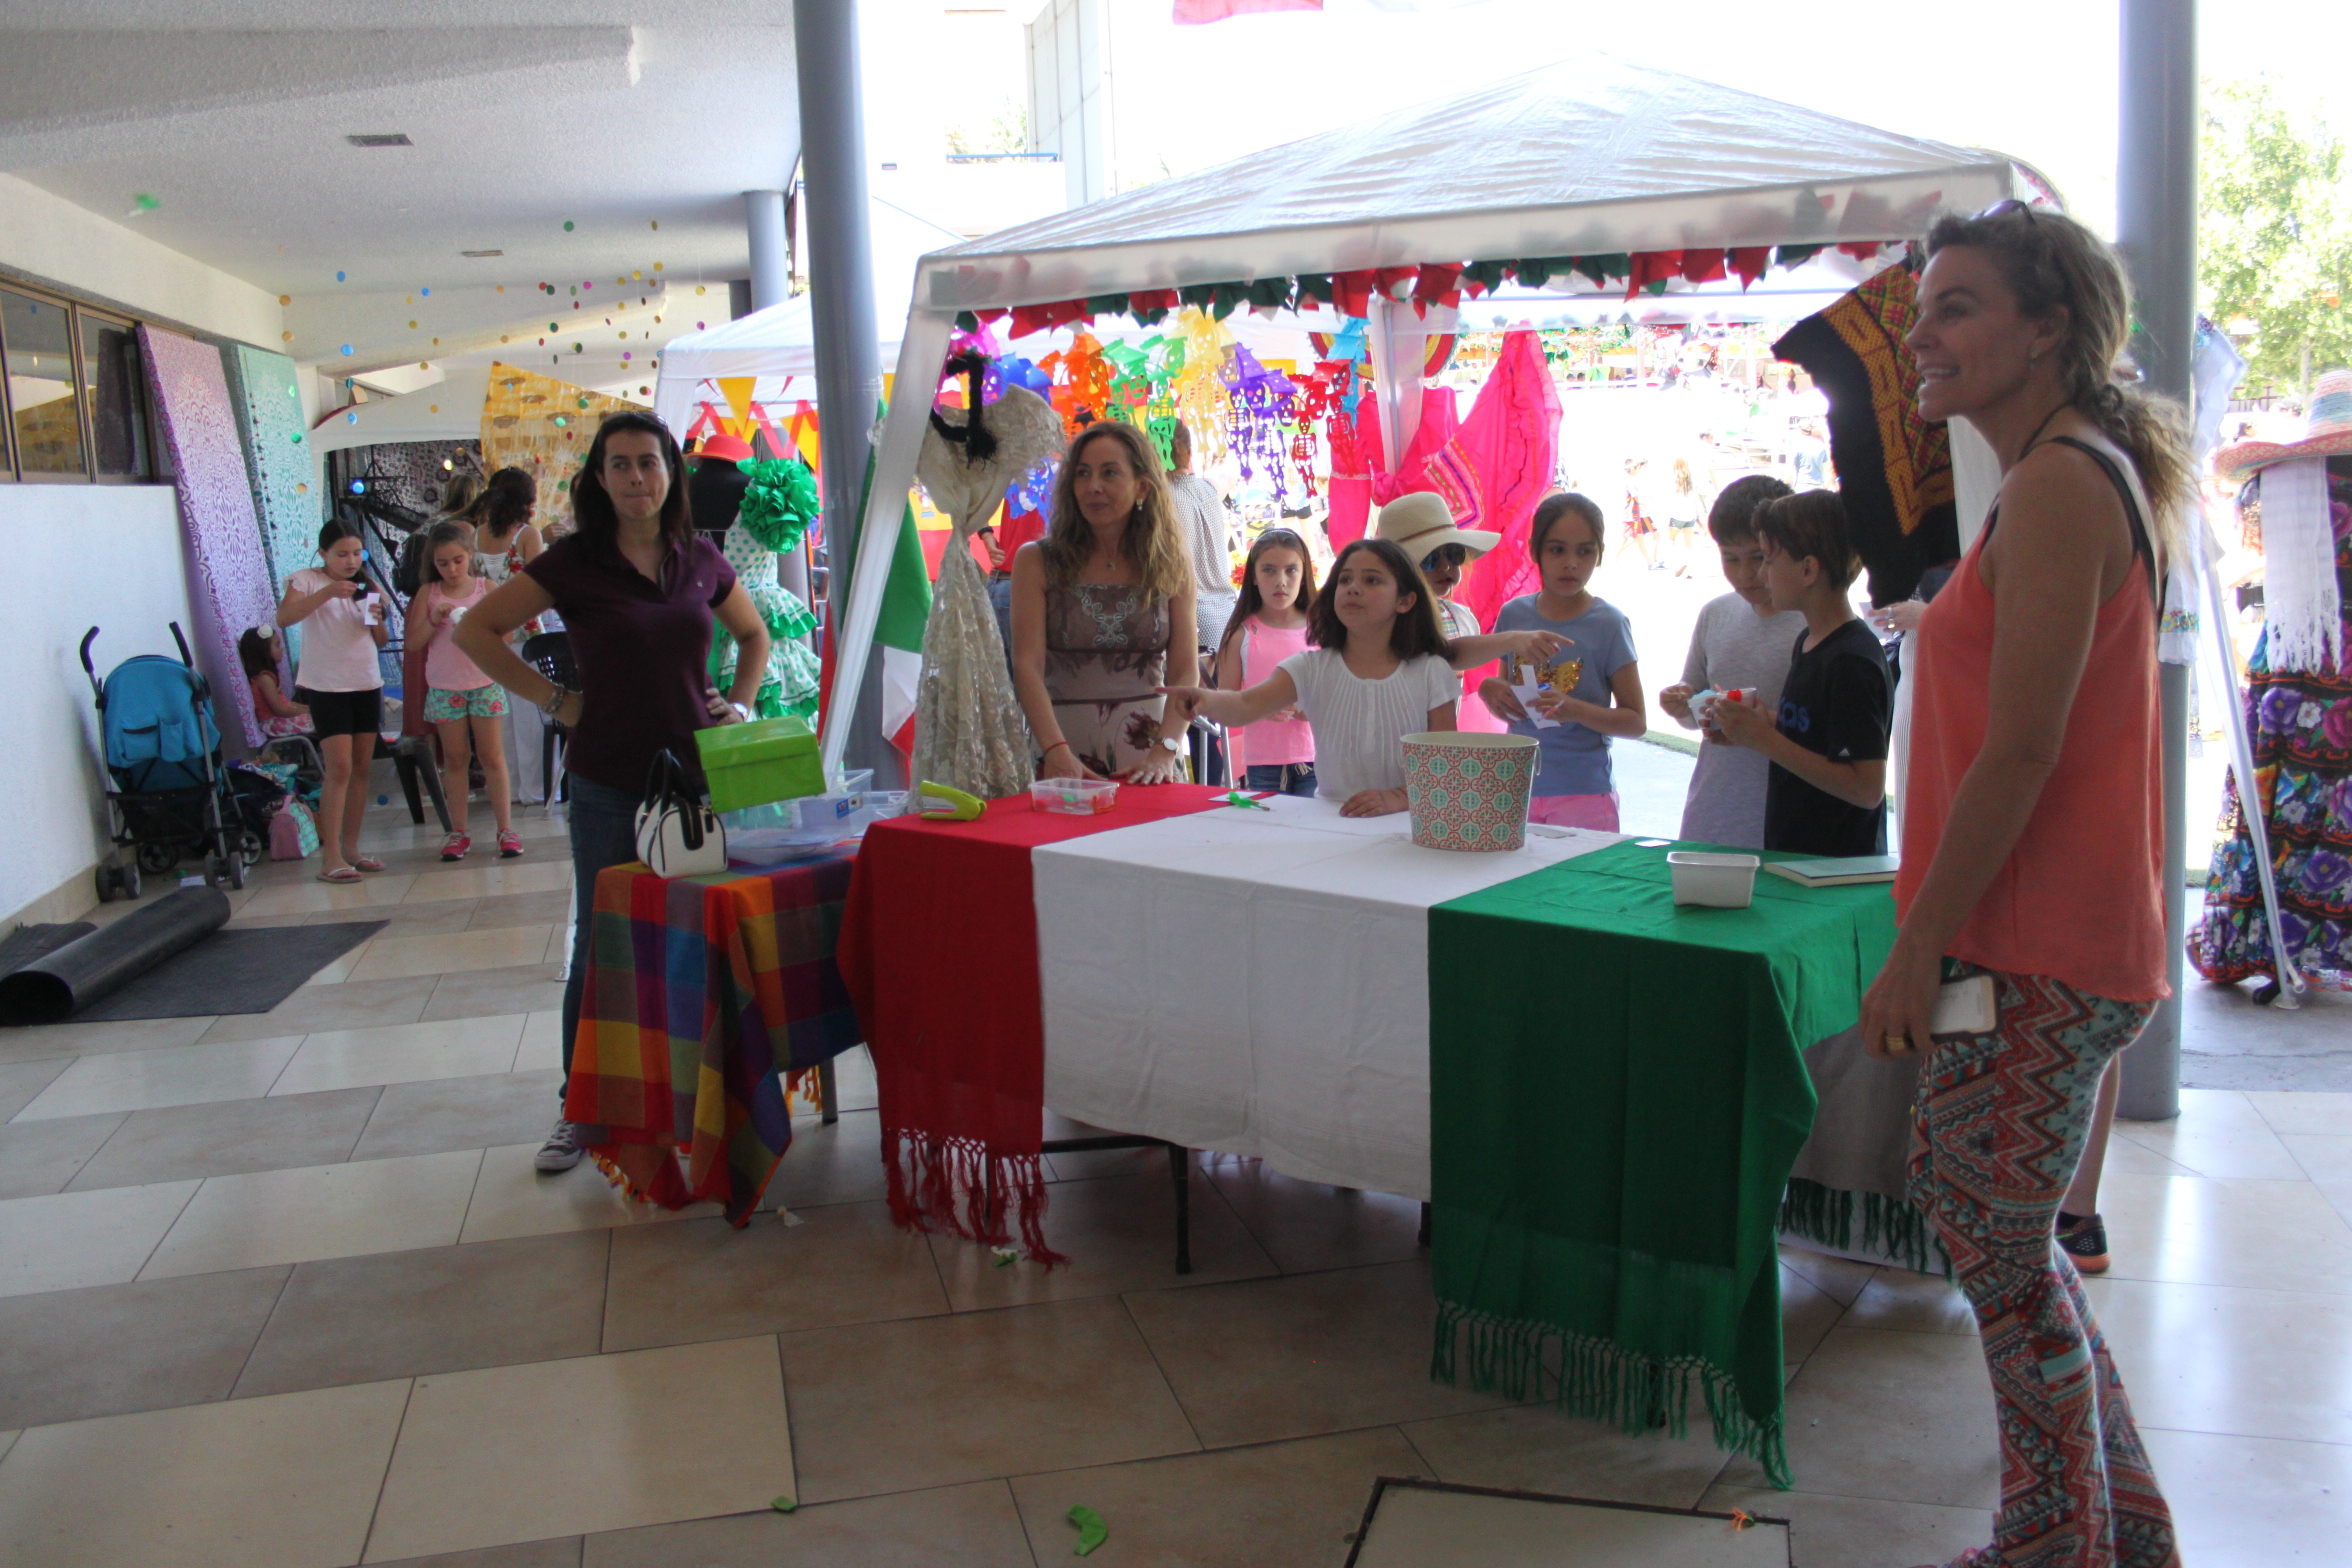 Kermesse: Stand México